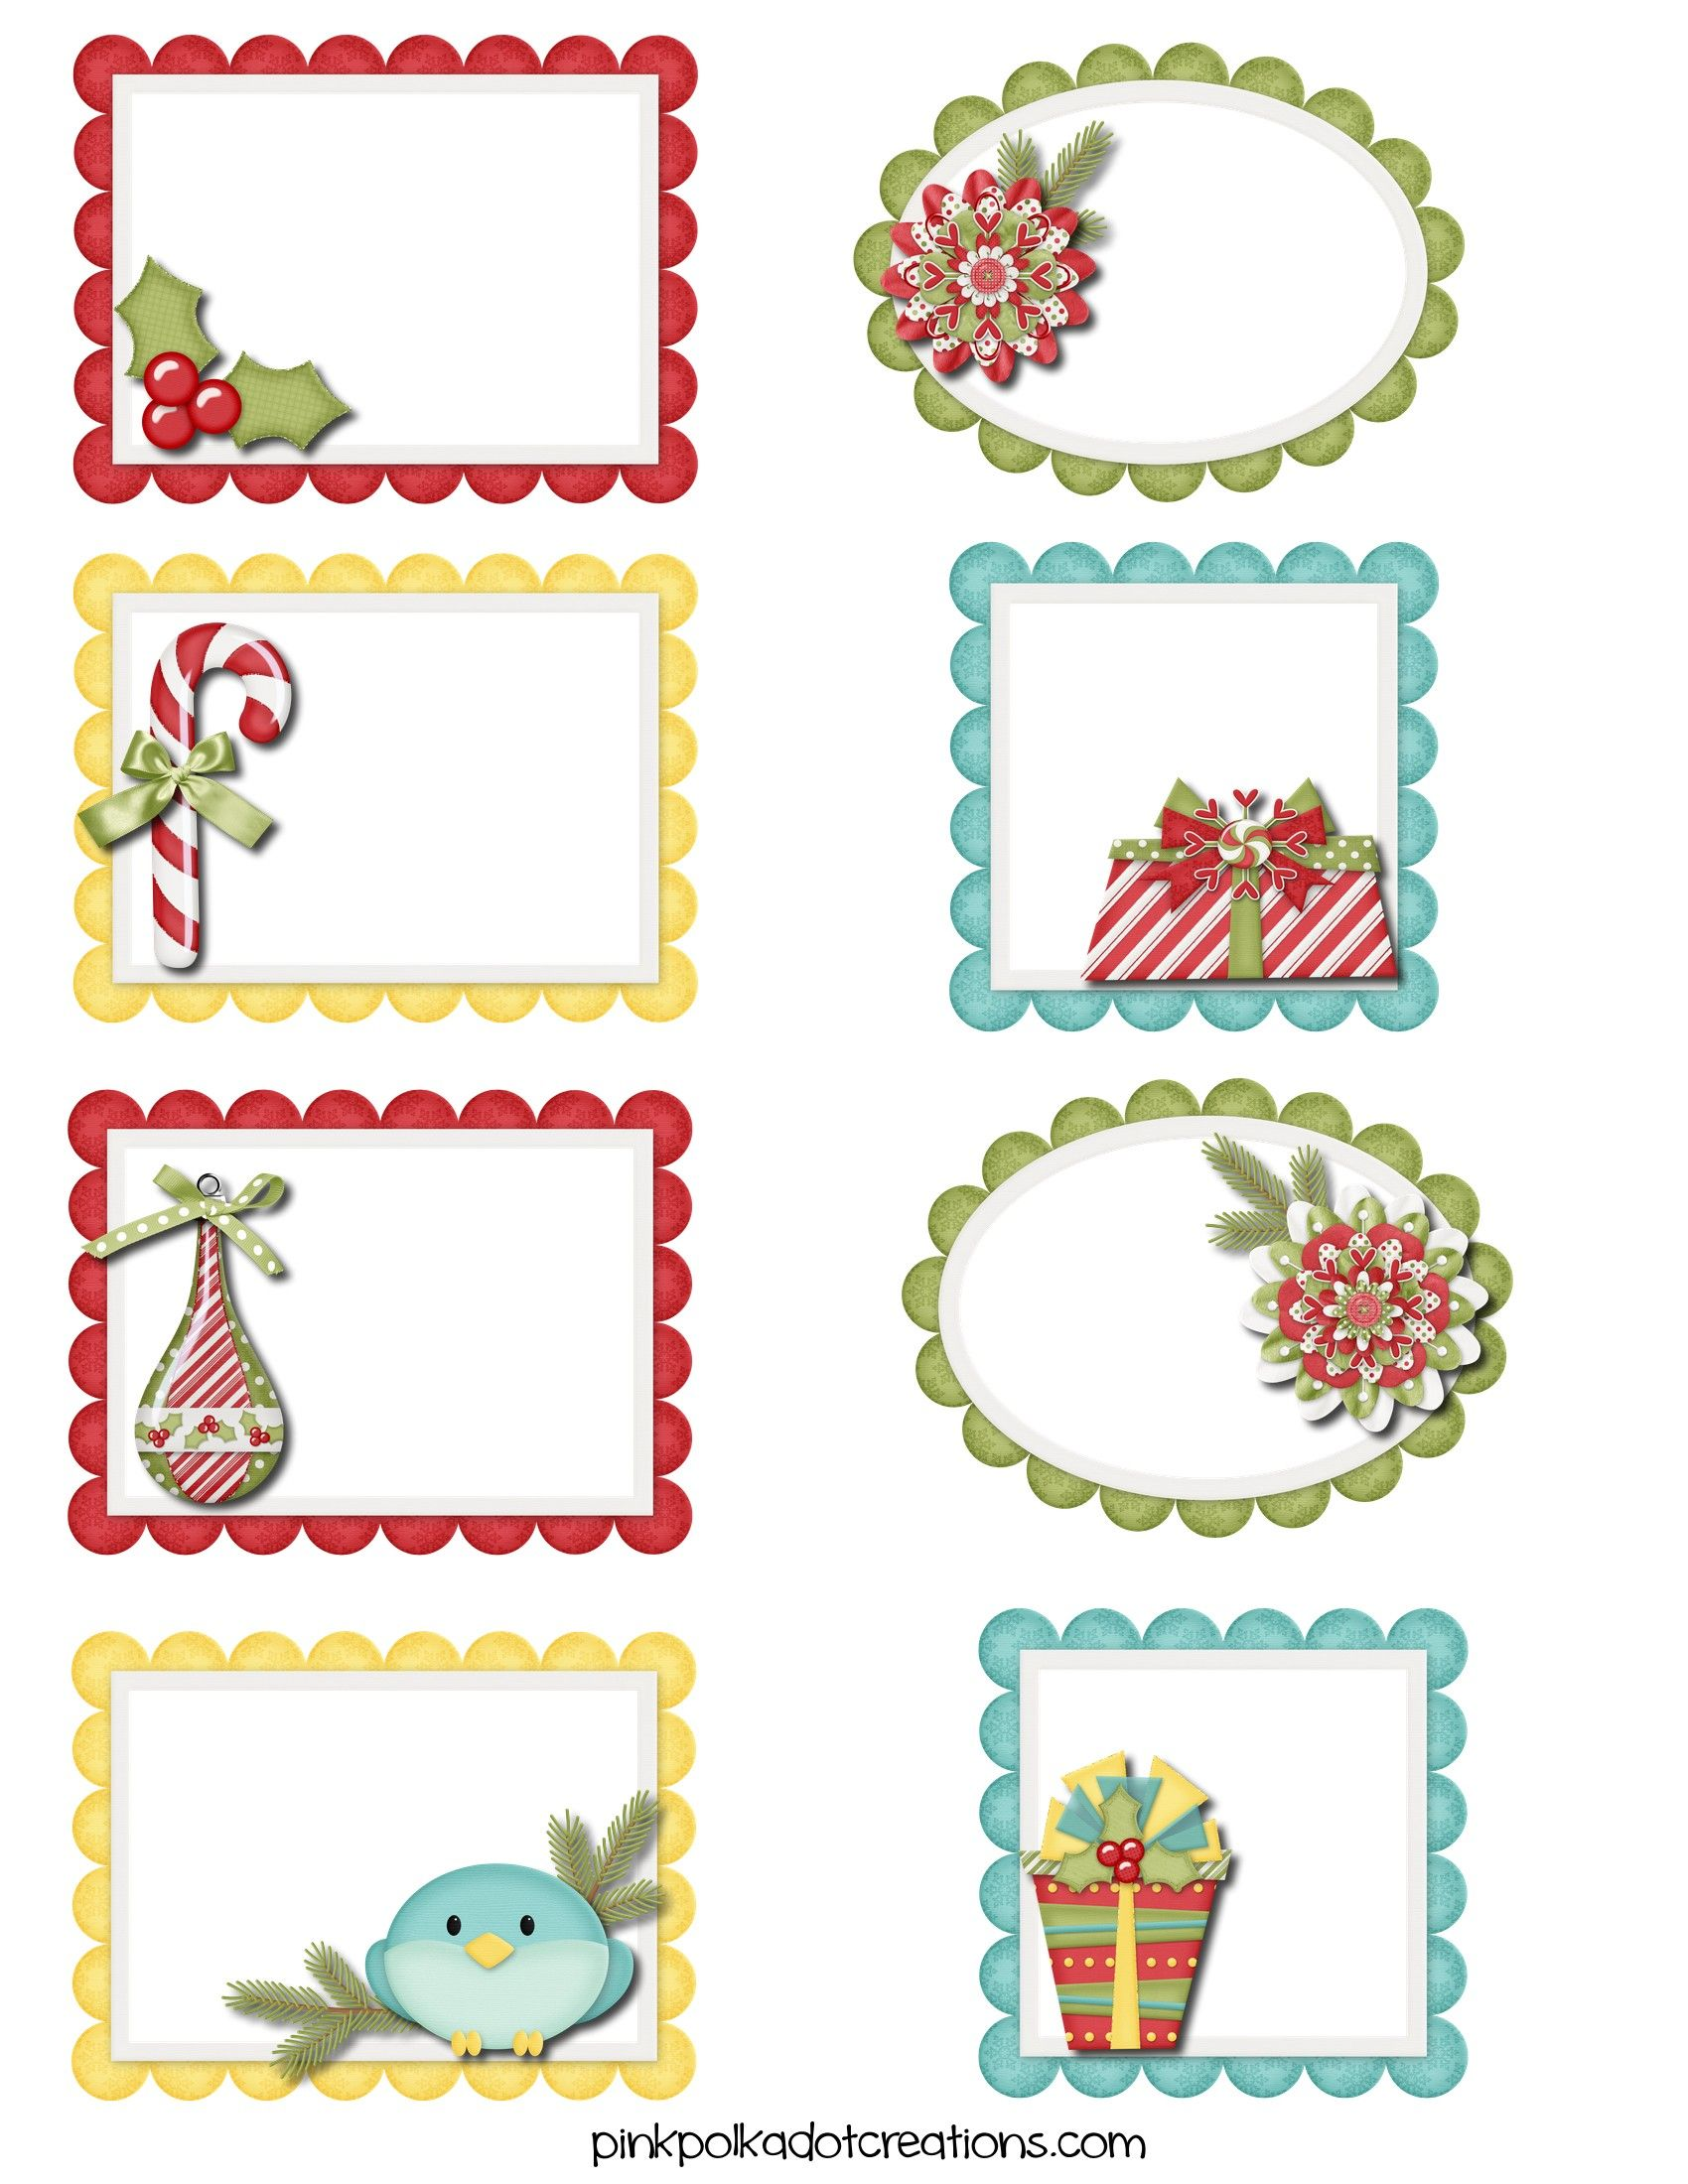 labels template free blue polka dot label template jpg letterhead